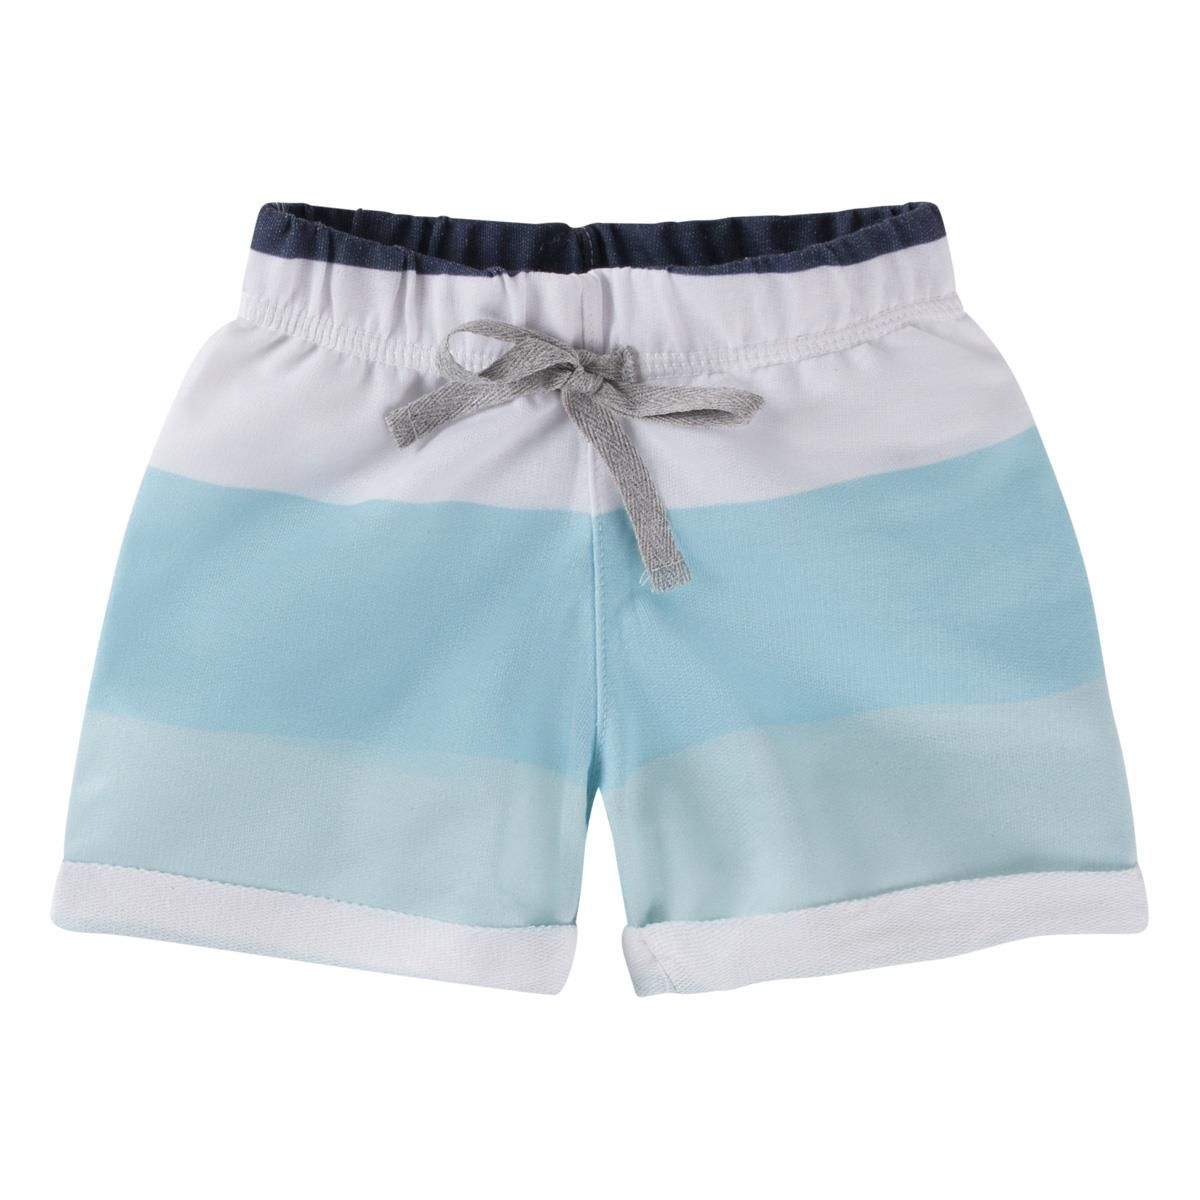 Conjunto Camiseta e Shorts - Nautico